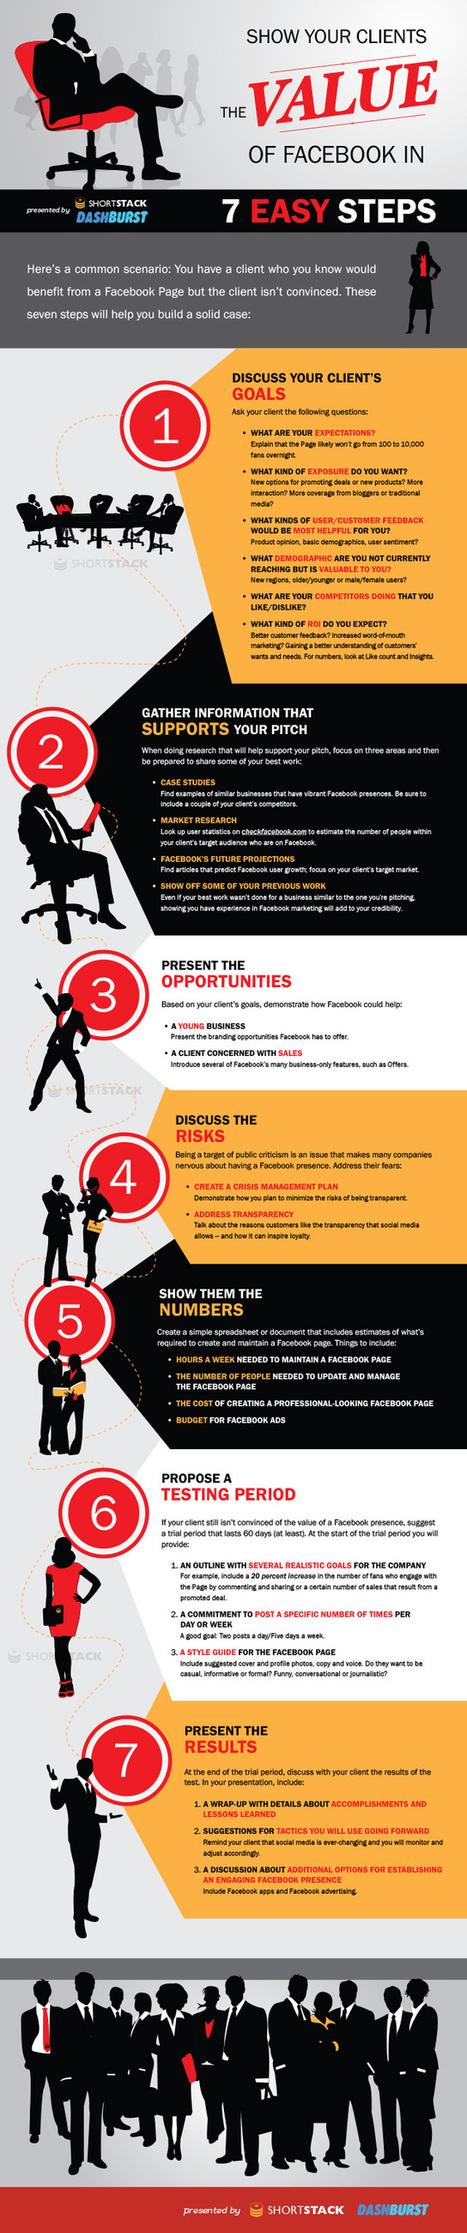 Social Media Managers: How To Explain Facebook Value [Infographic] - Bit Rebels | Social Media & Internet Marketing Infographics | Scoop.it